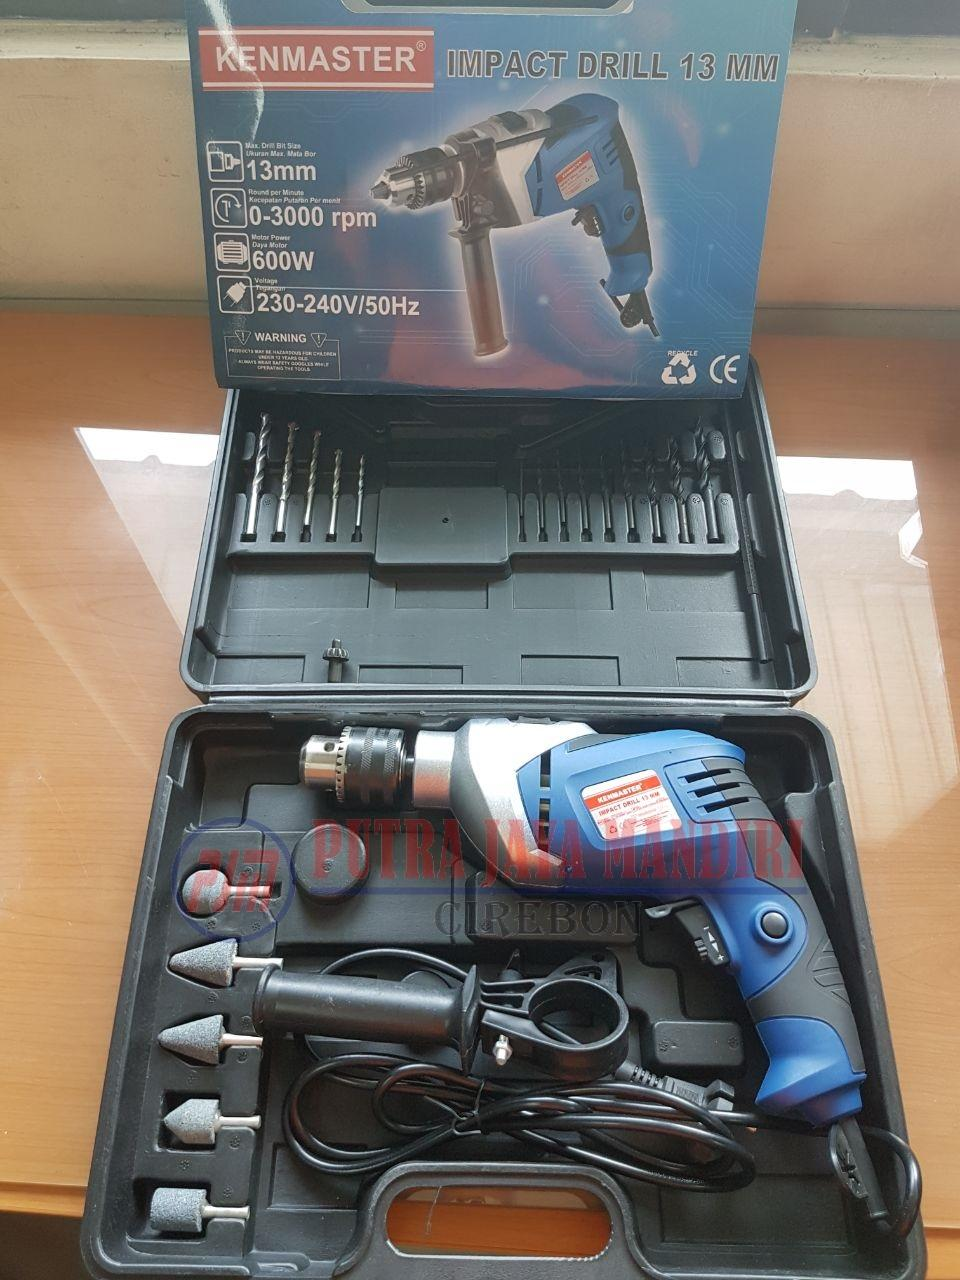 Ini Dia Black Decker Hammer Impact Power Drill 10mm Tp555 Bor Mesin 13mm Shimeta Kenmaster Beton Tembok Koper With Box